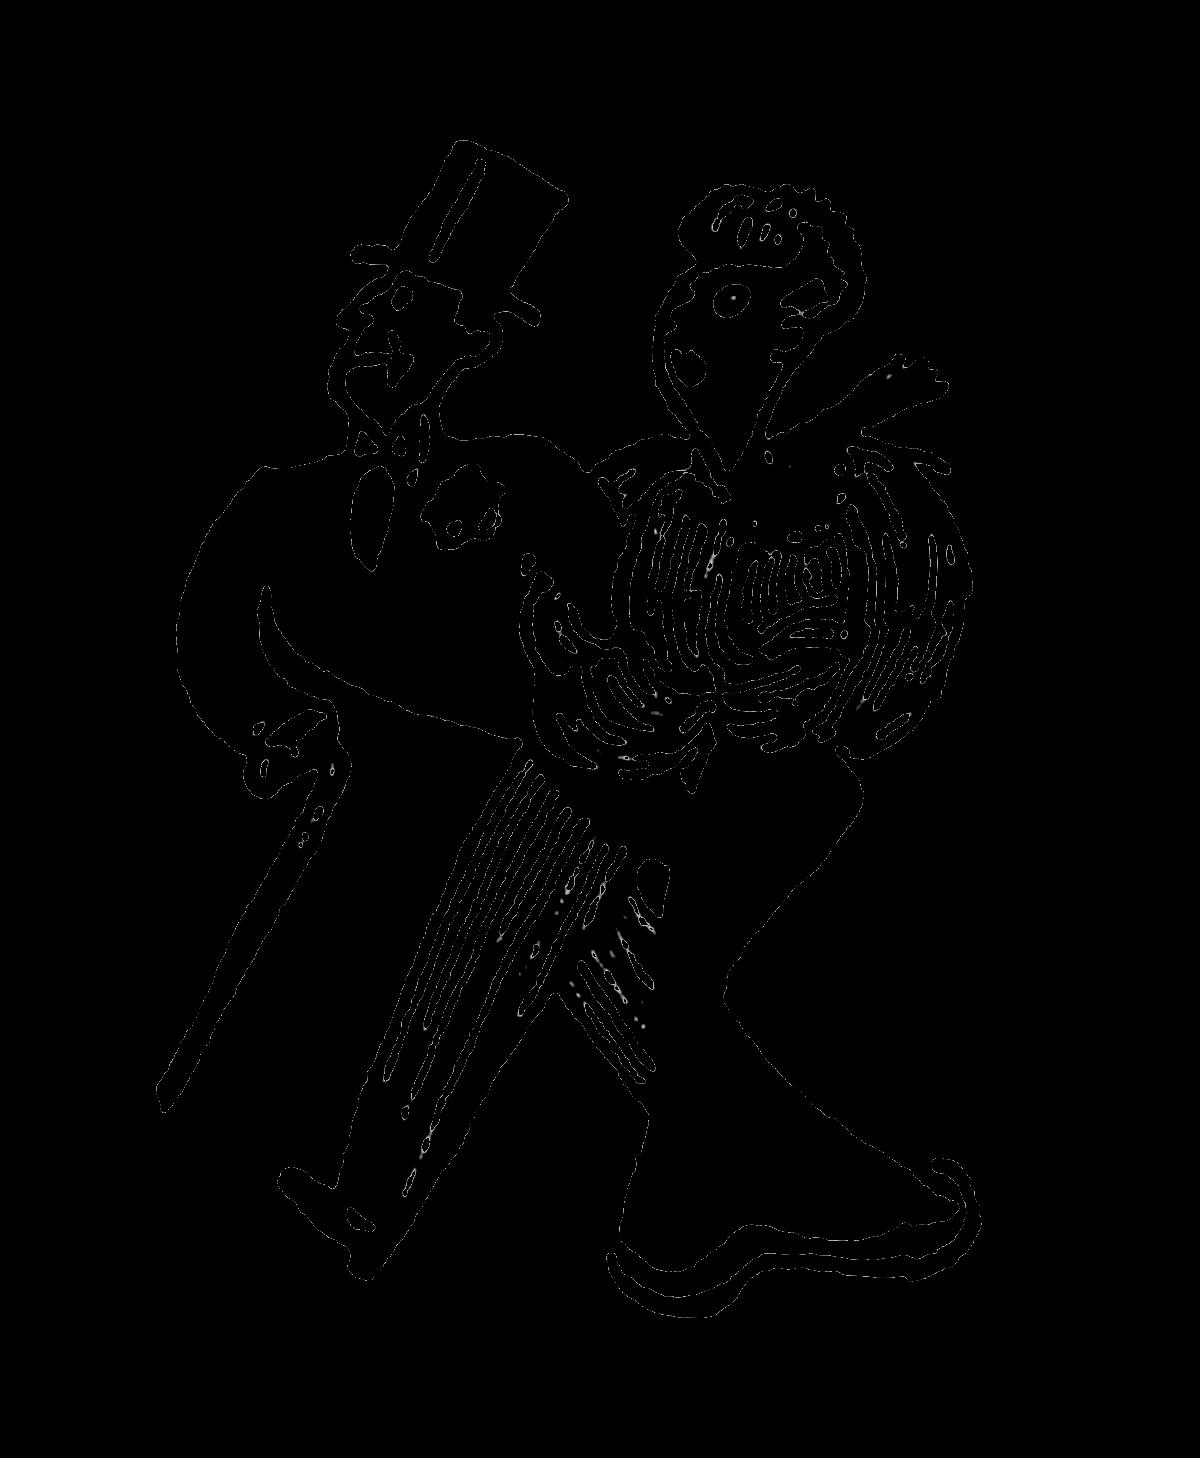 Digital Stamp Design Vintage Theater Entertainment